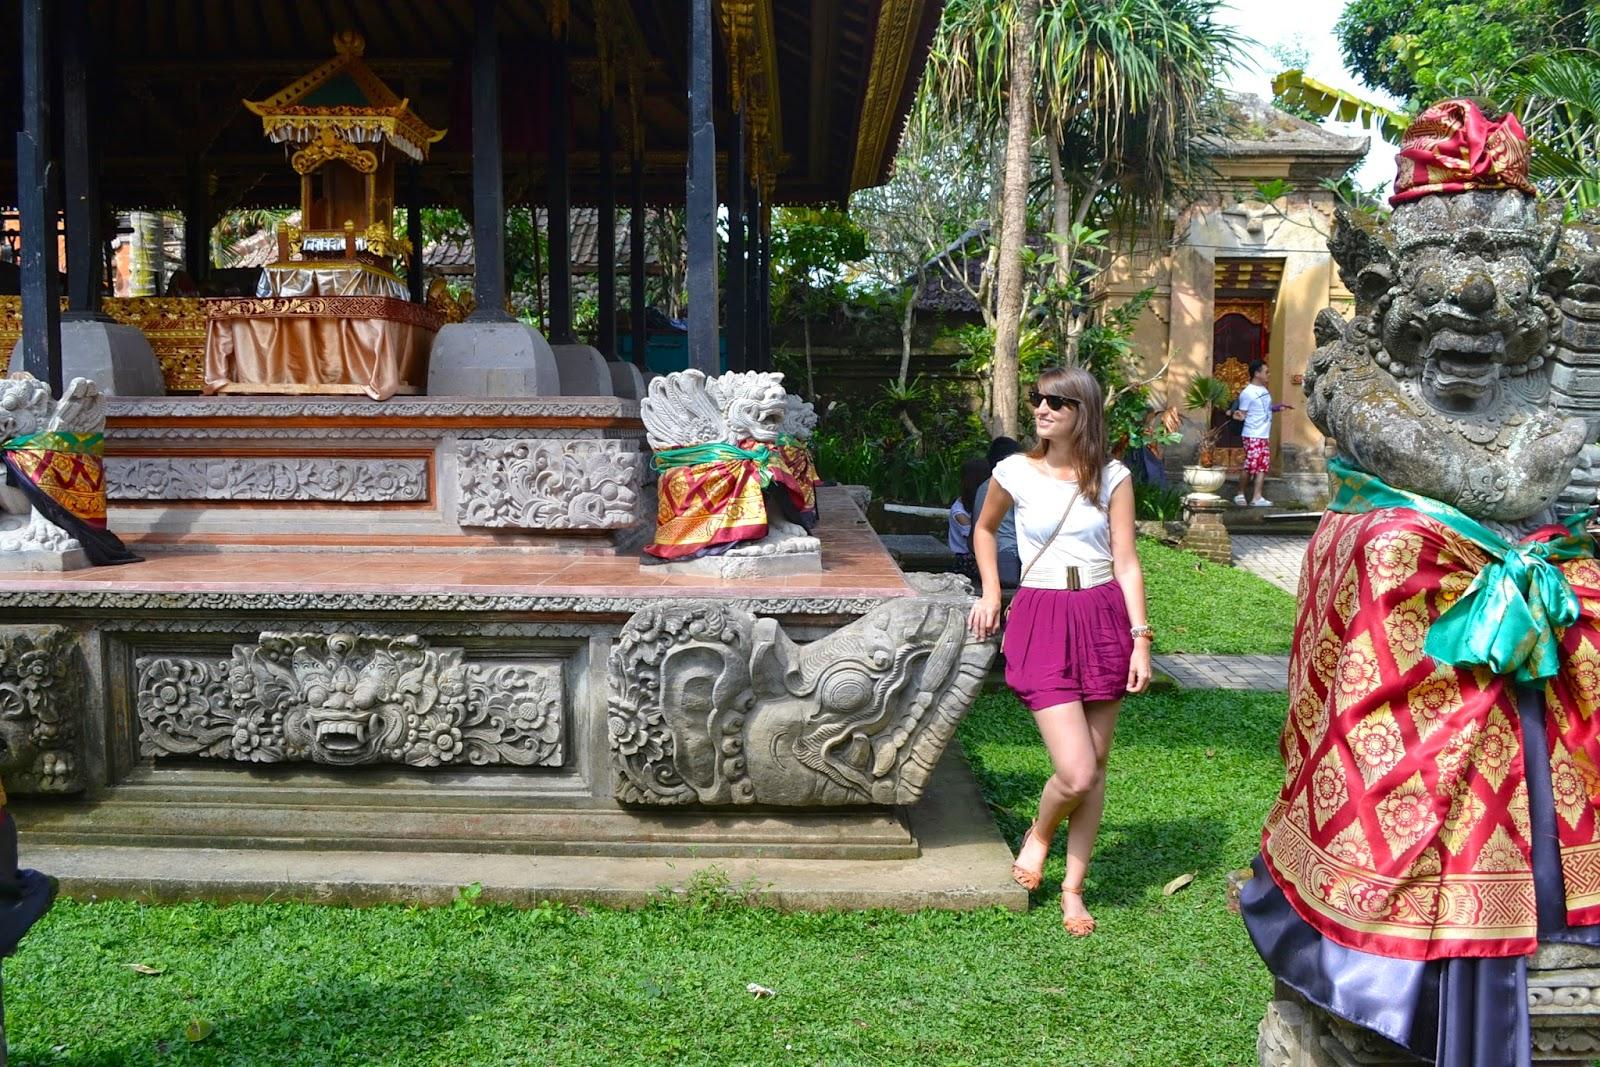 Palacio real de Ubud, Bali, Indonesia